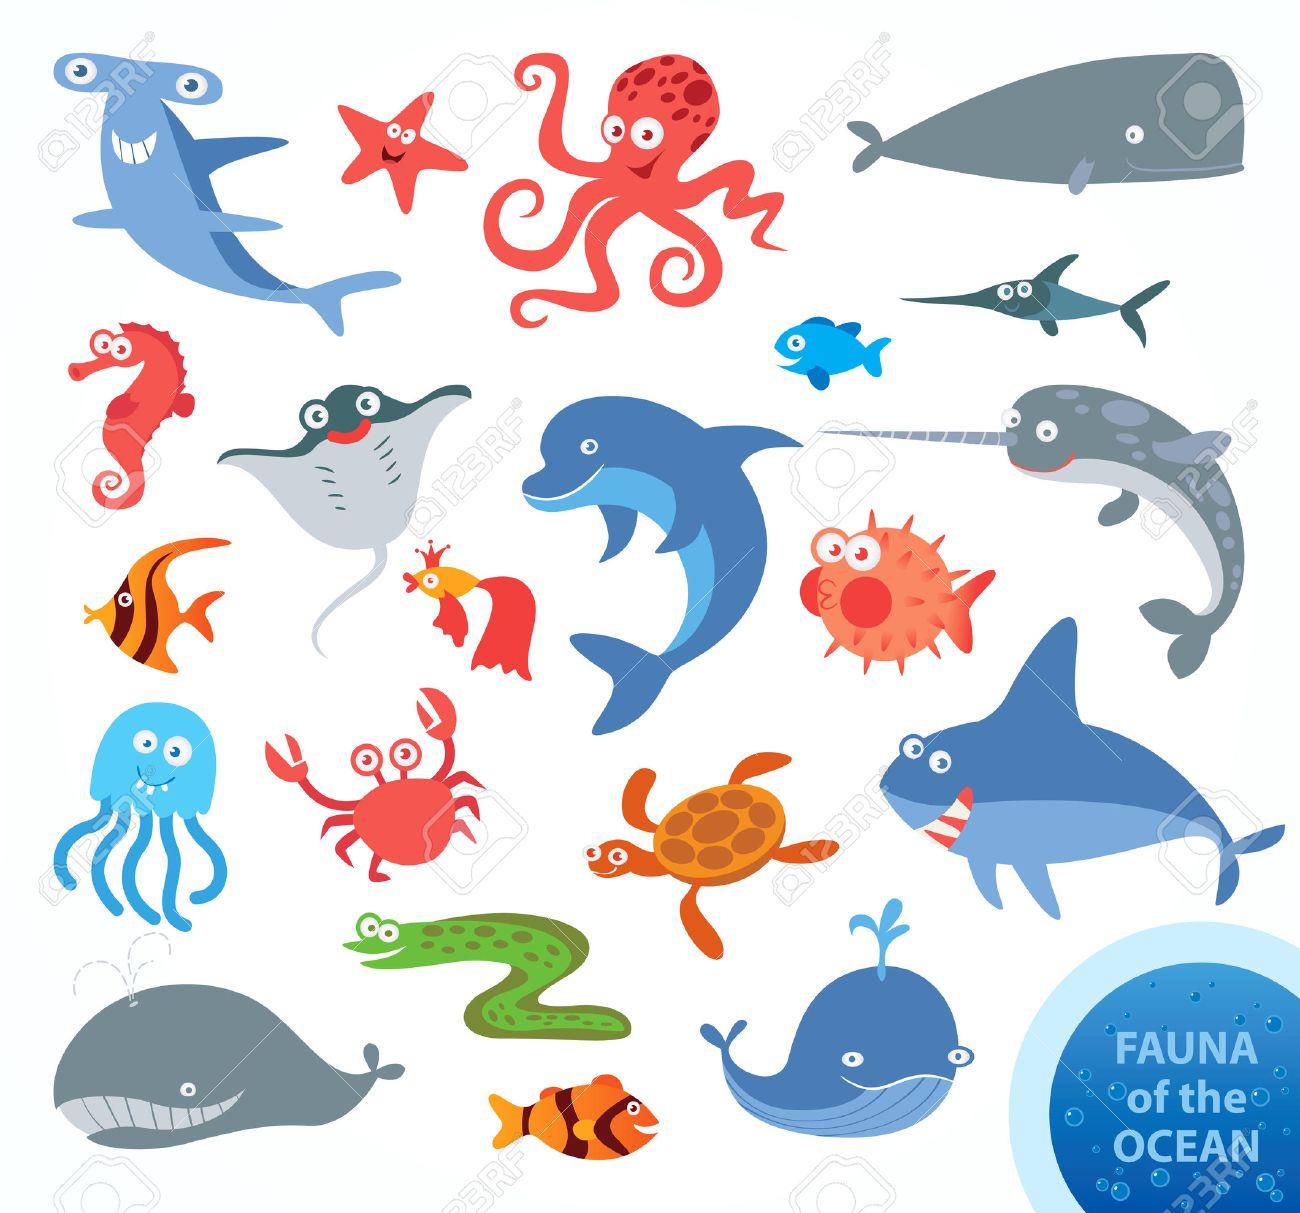 Set funny fauna of ocean. Narwhal, hammerhead shark, white shark, whale, dolphin, swordfish, turtle, jellyfish, octopus, sea horse, crab, starfish. Funny cartoon character. Vector illustration - 50125477